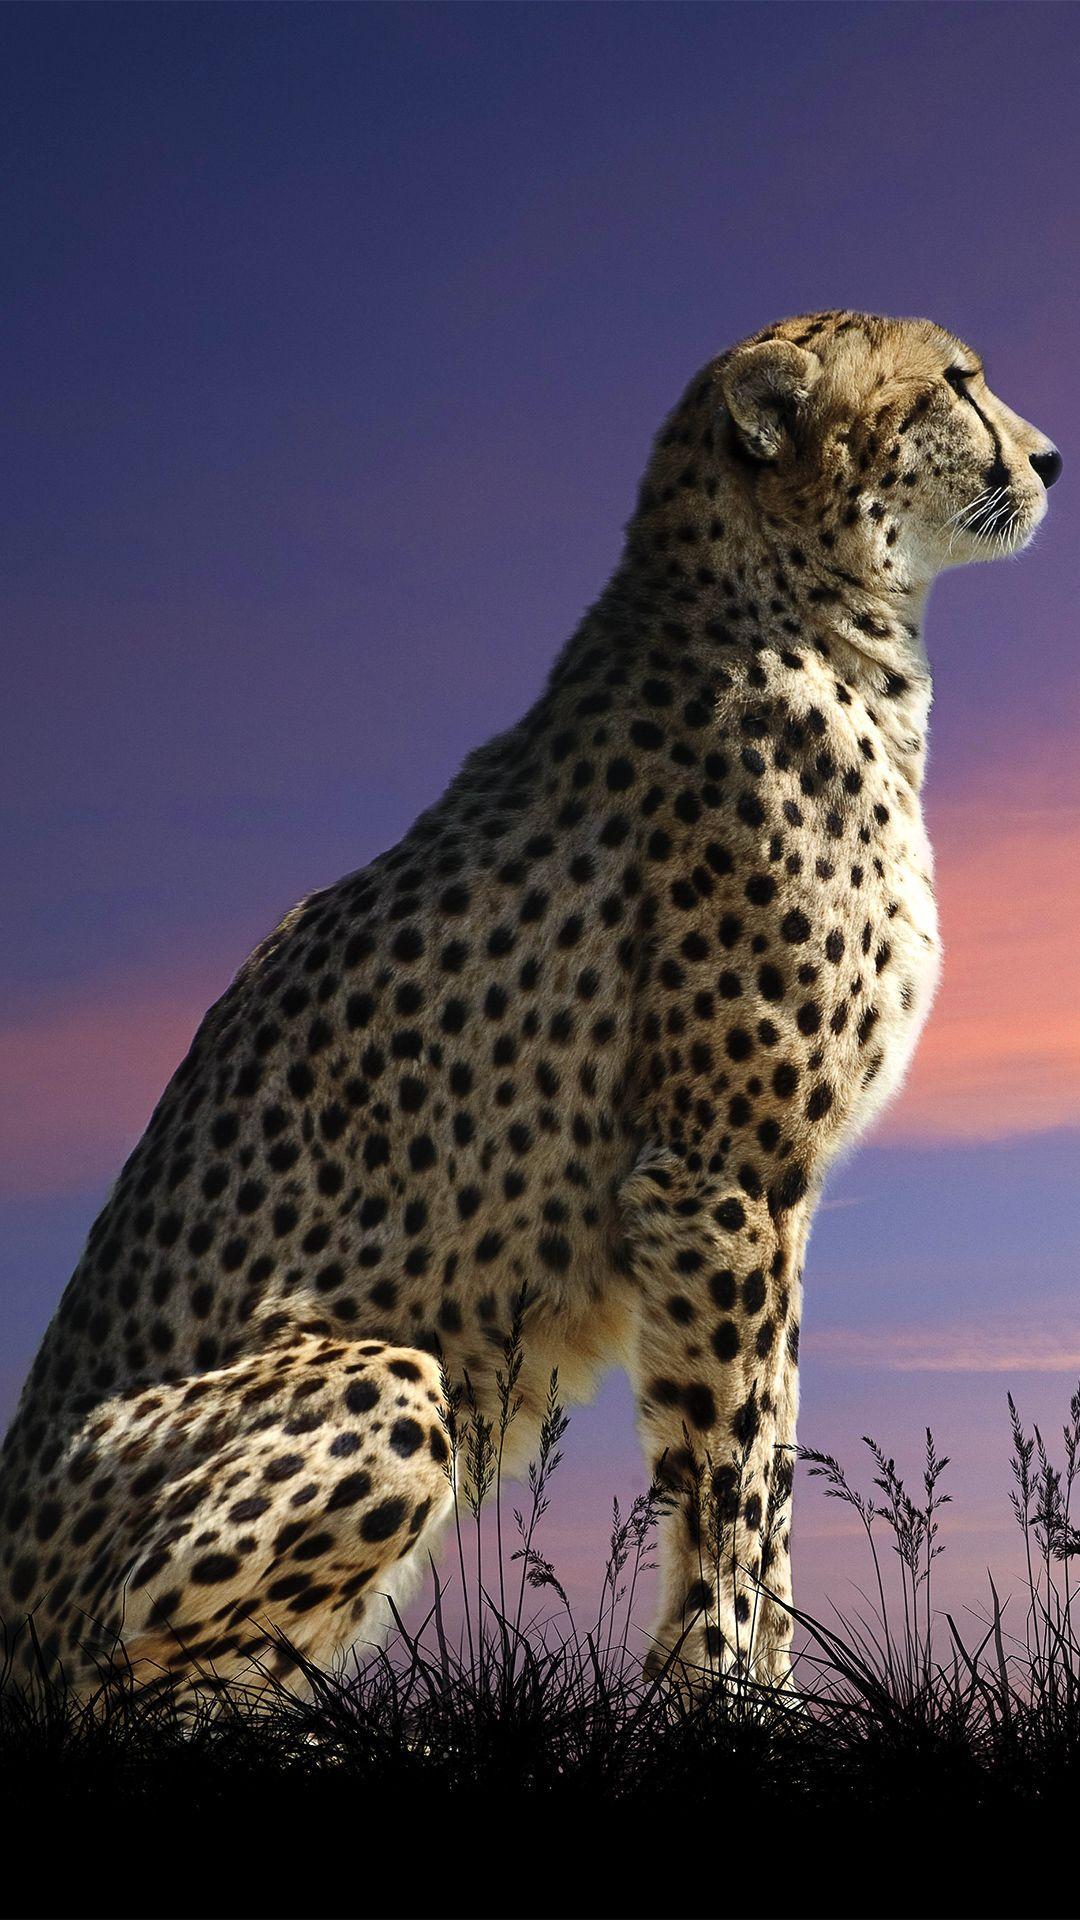 wallpaper.wiki-Cheetah-Wallpaper-Full-HD-for-Phone-